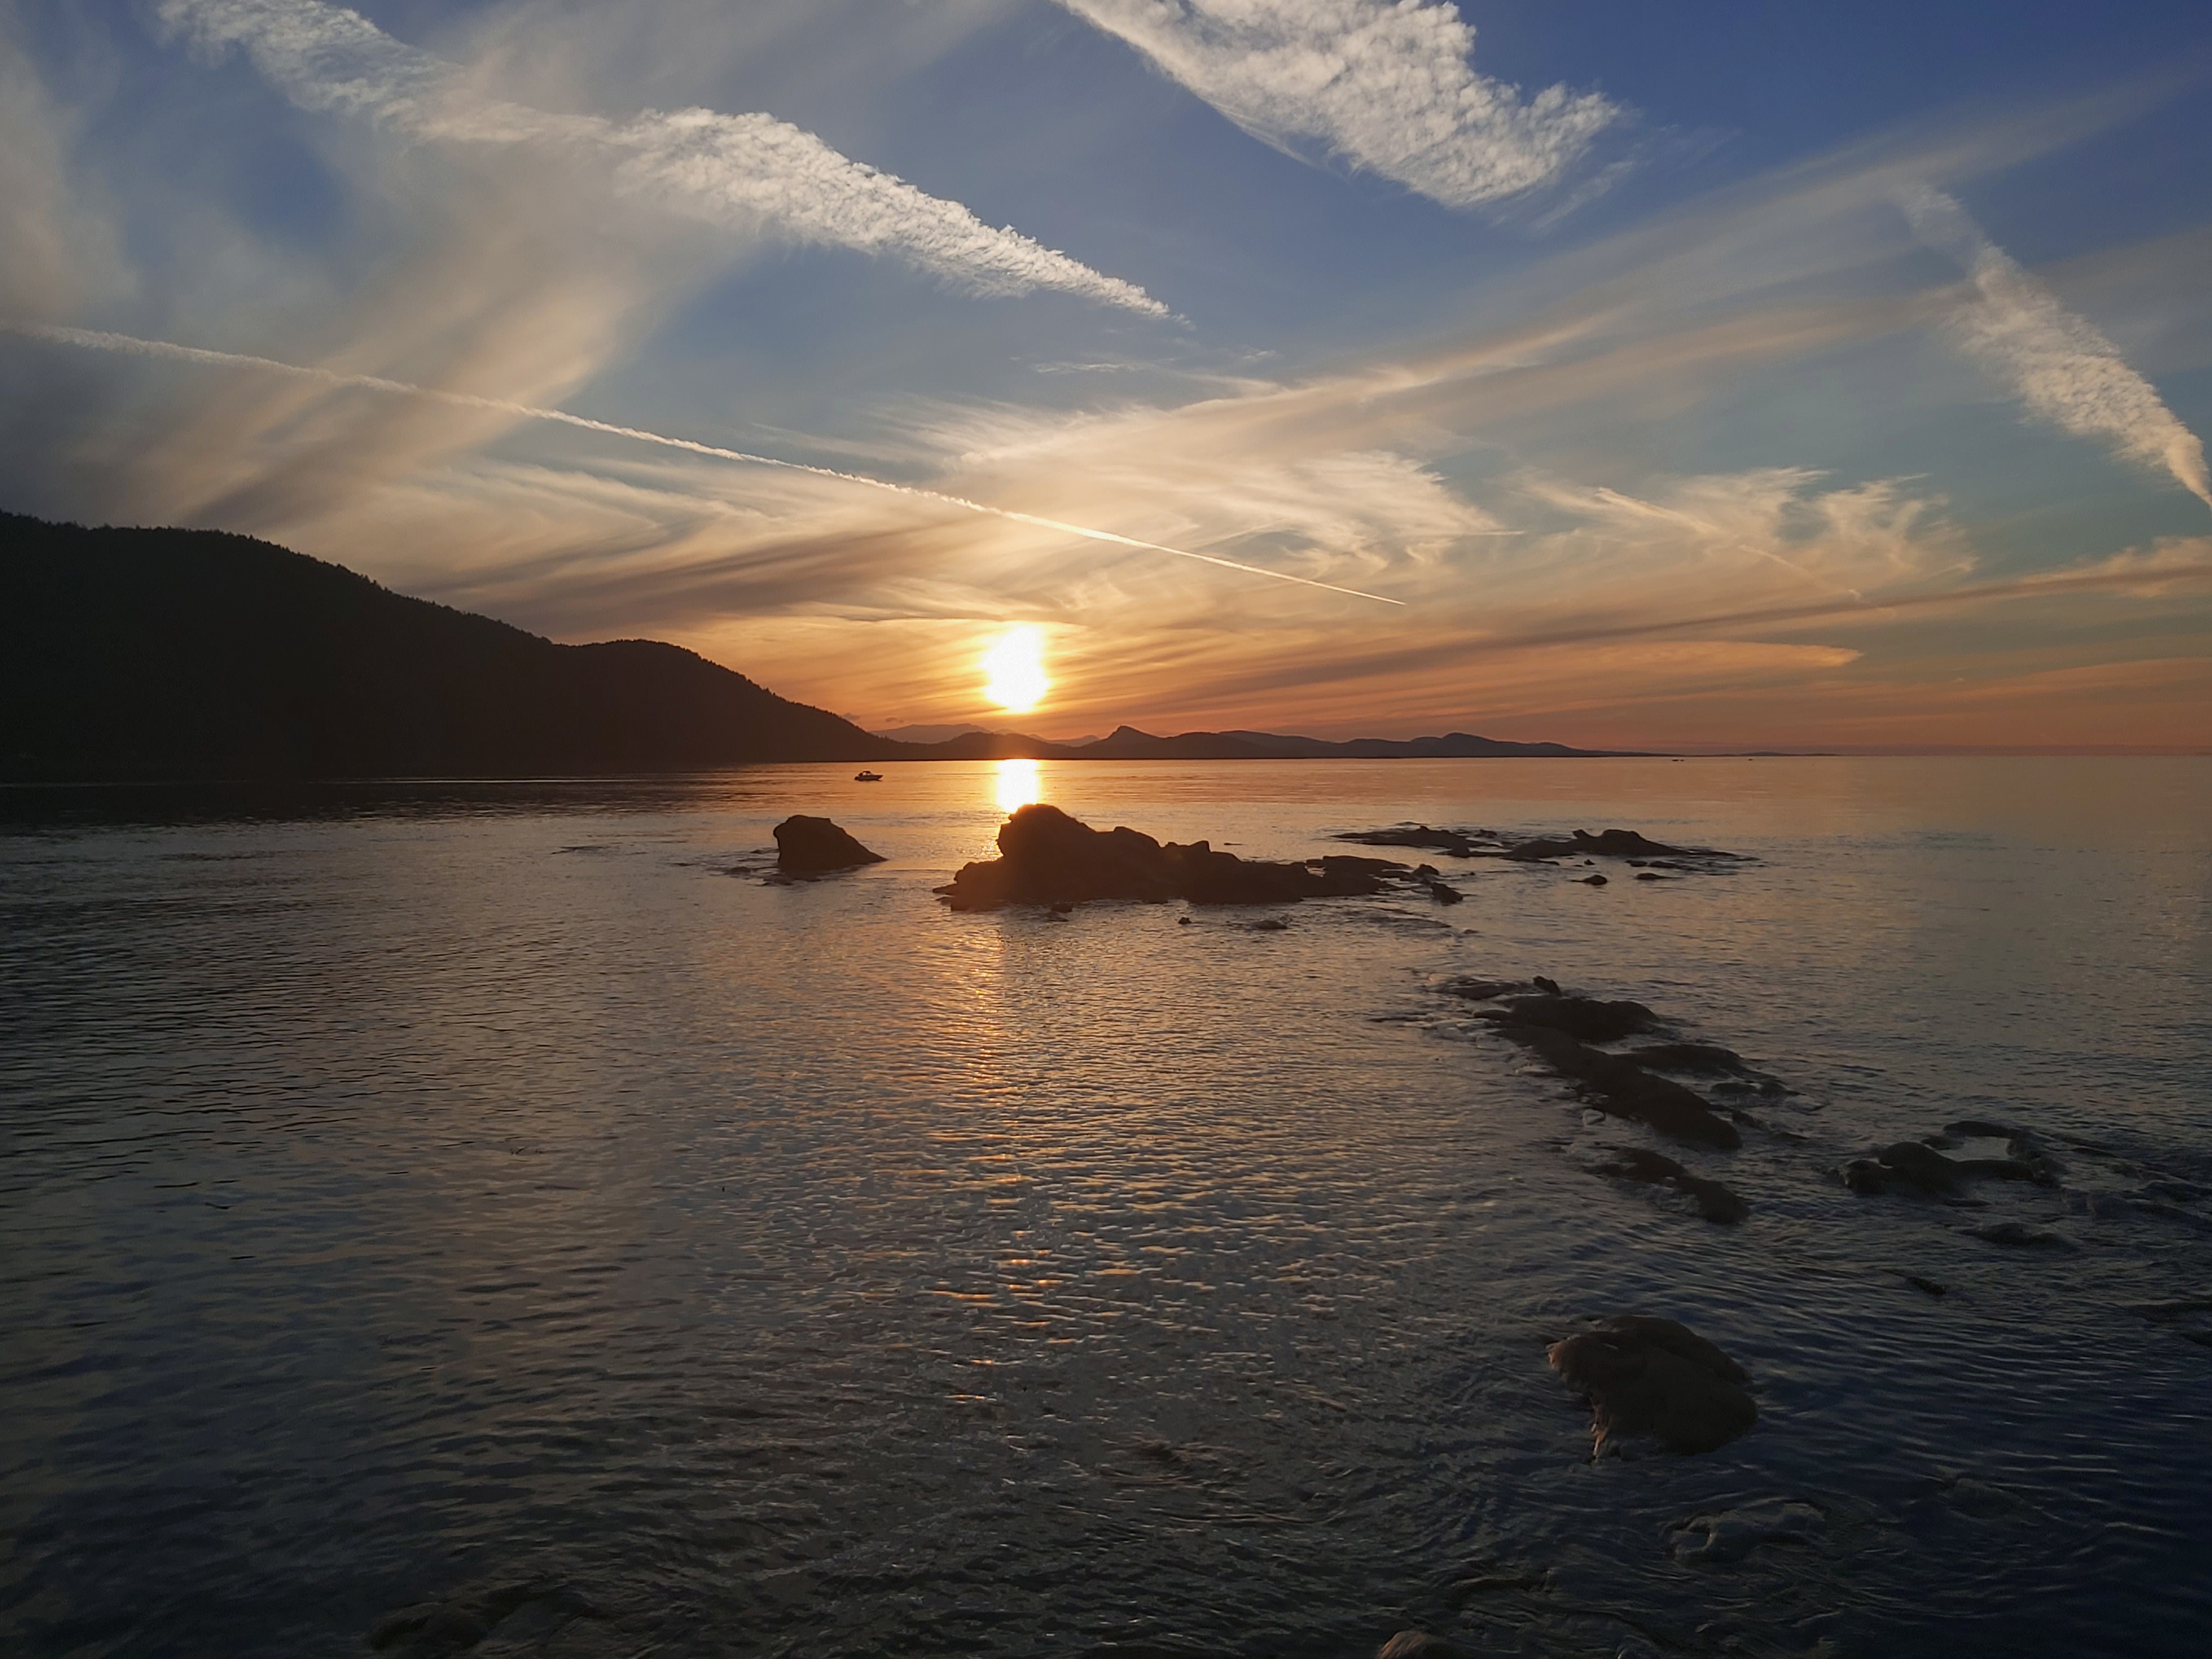 Sunset from Tumbo Island - Quinn Ramsay